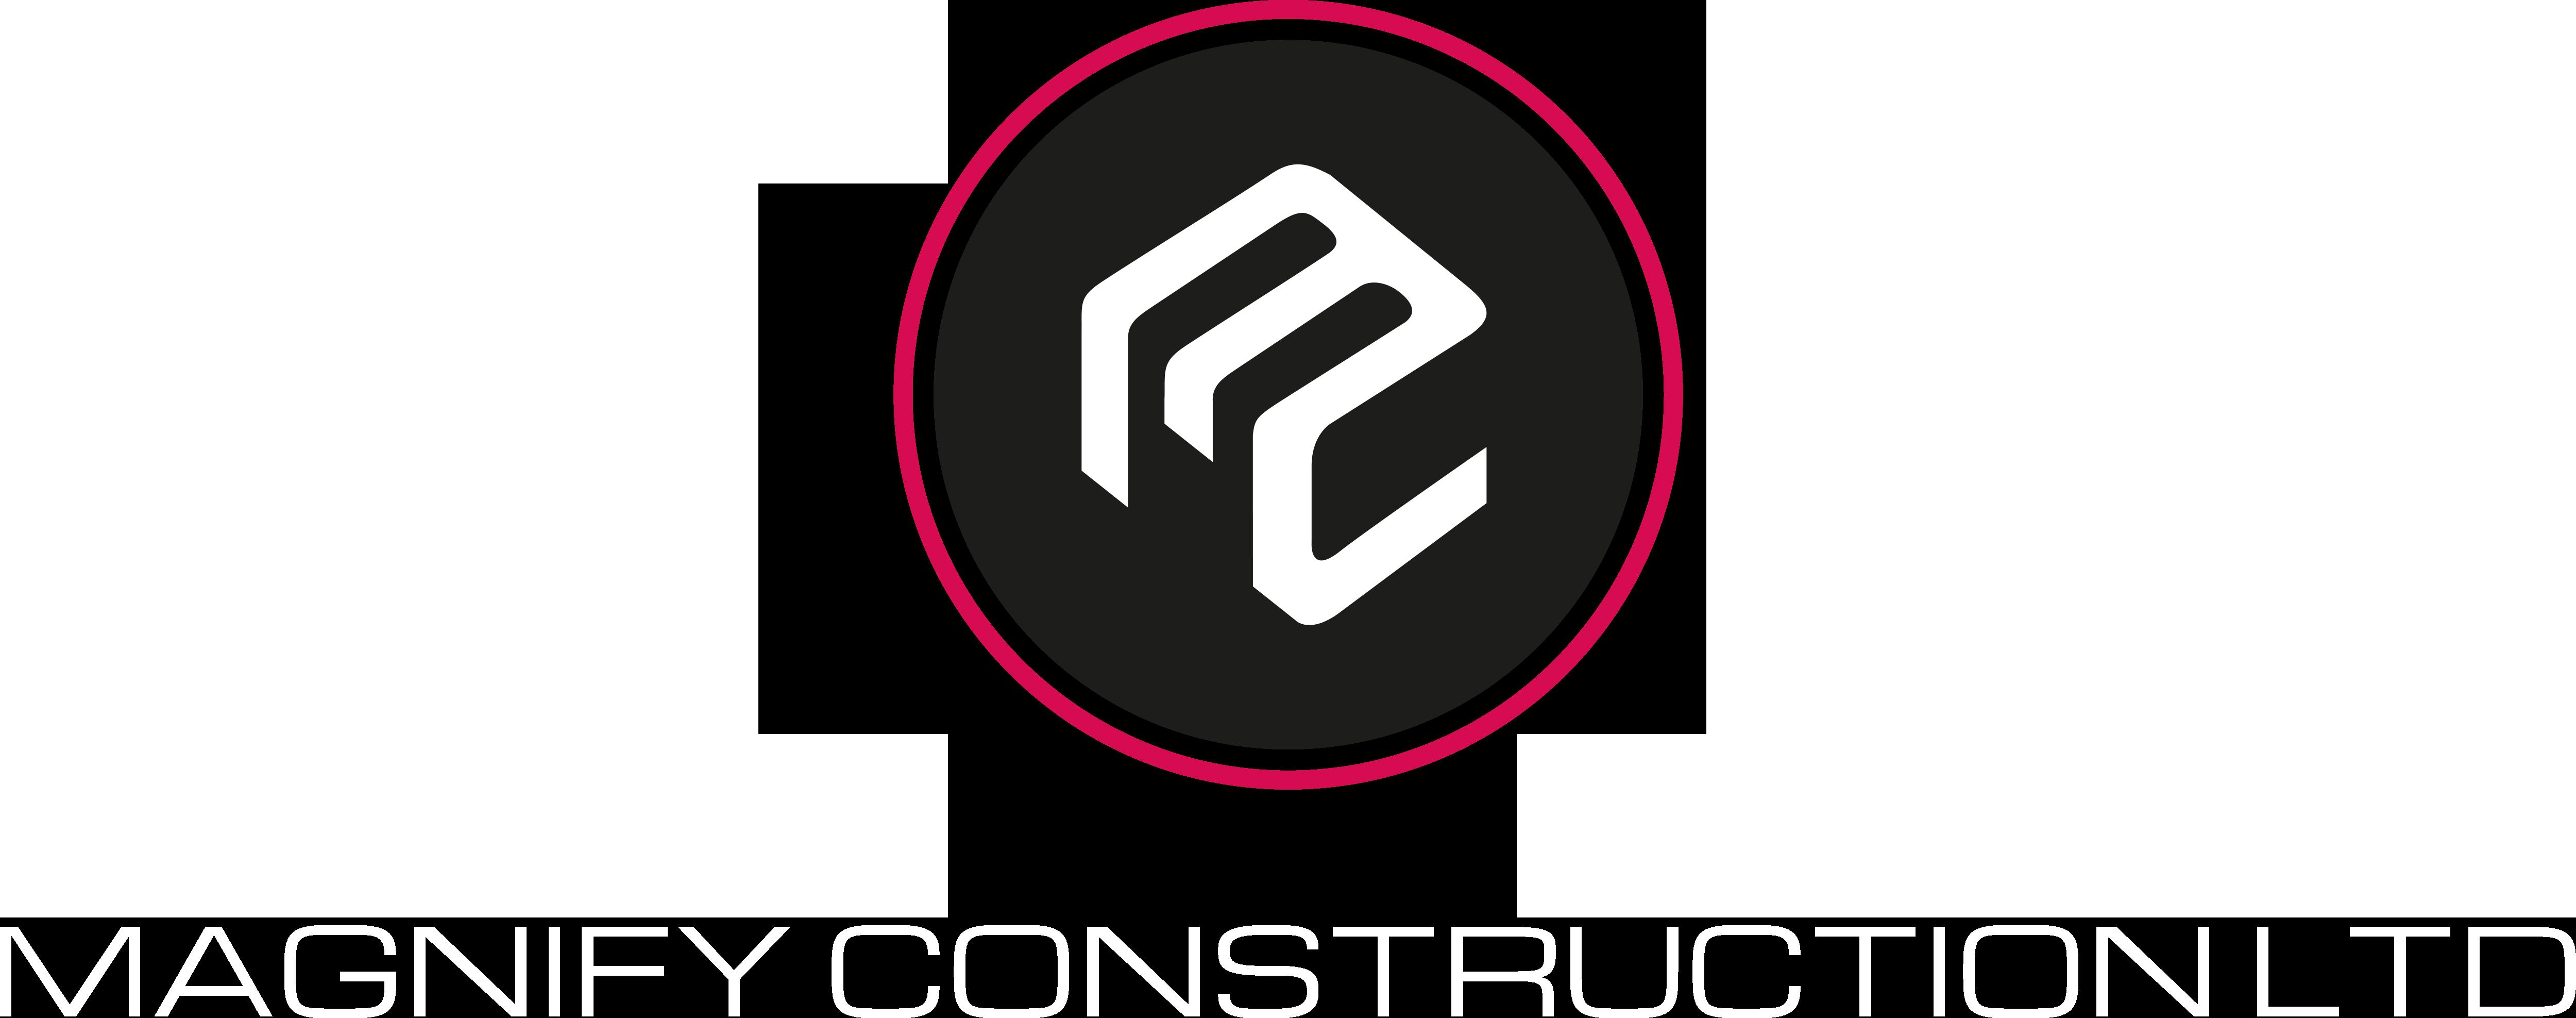 Magnify Construction Ltd